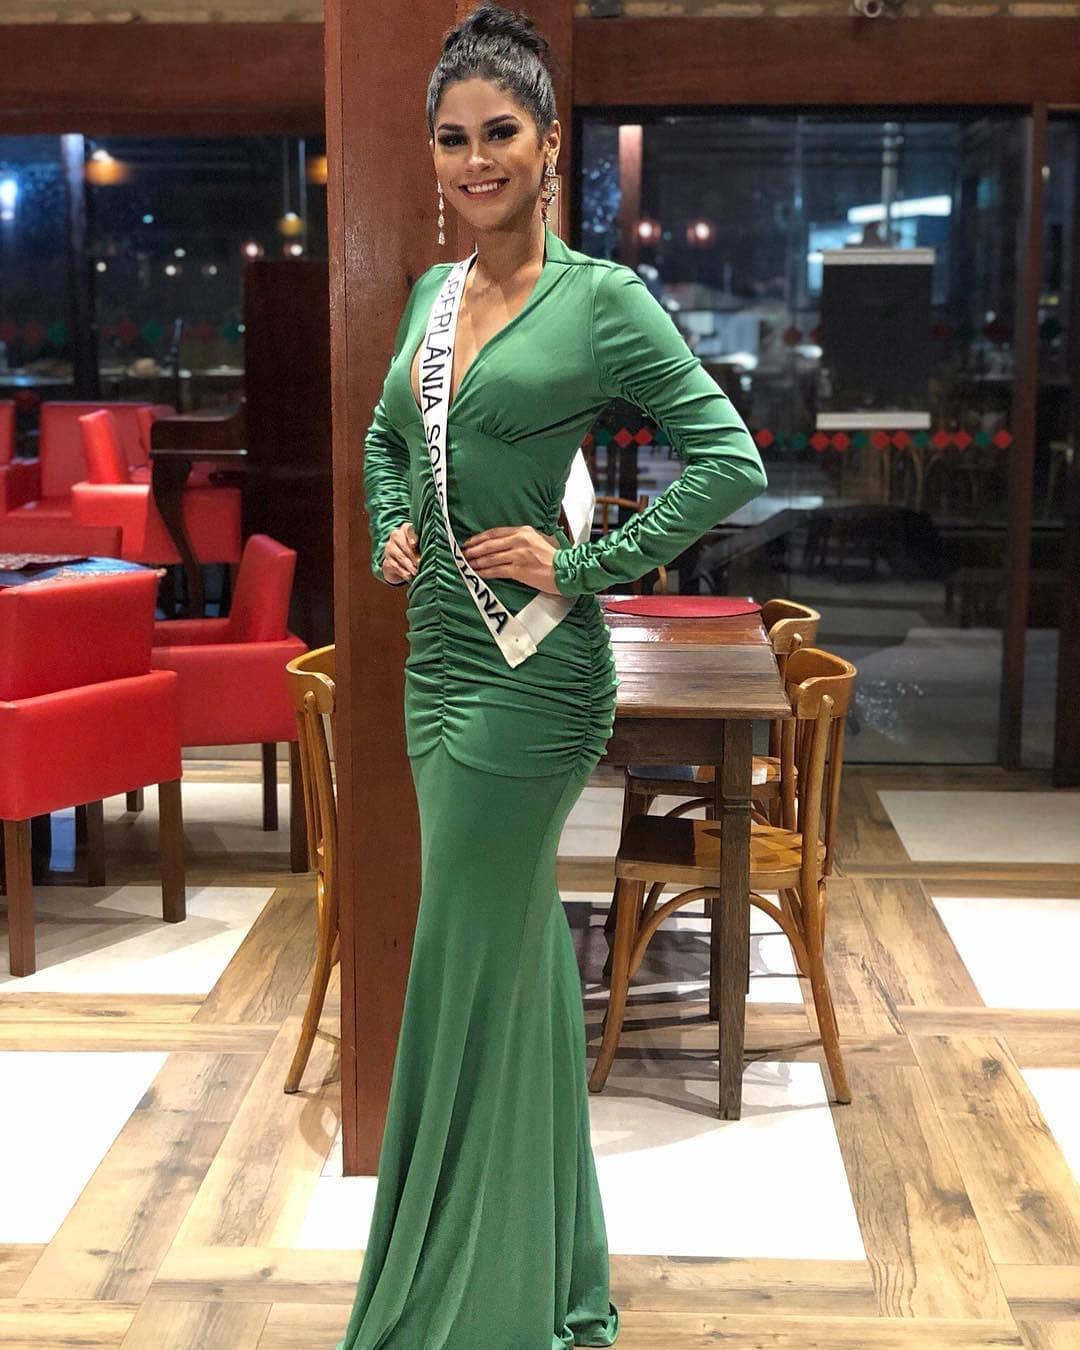 roberlania viana, candidata ao miss piaui 2019. - Página 2 50638511